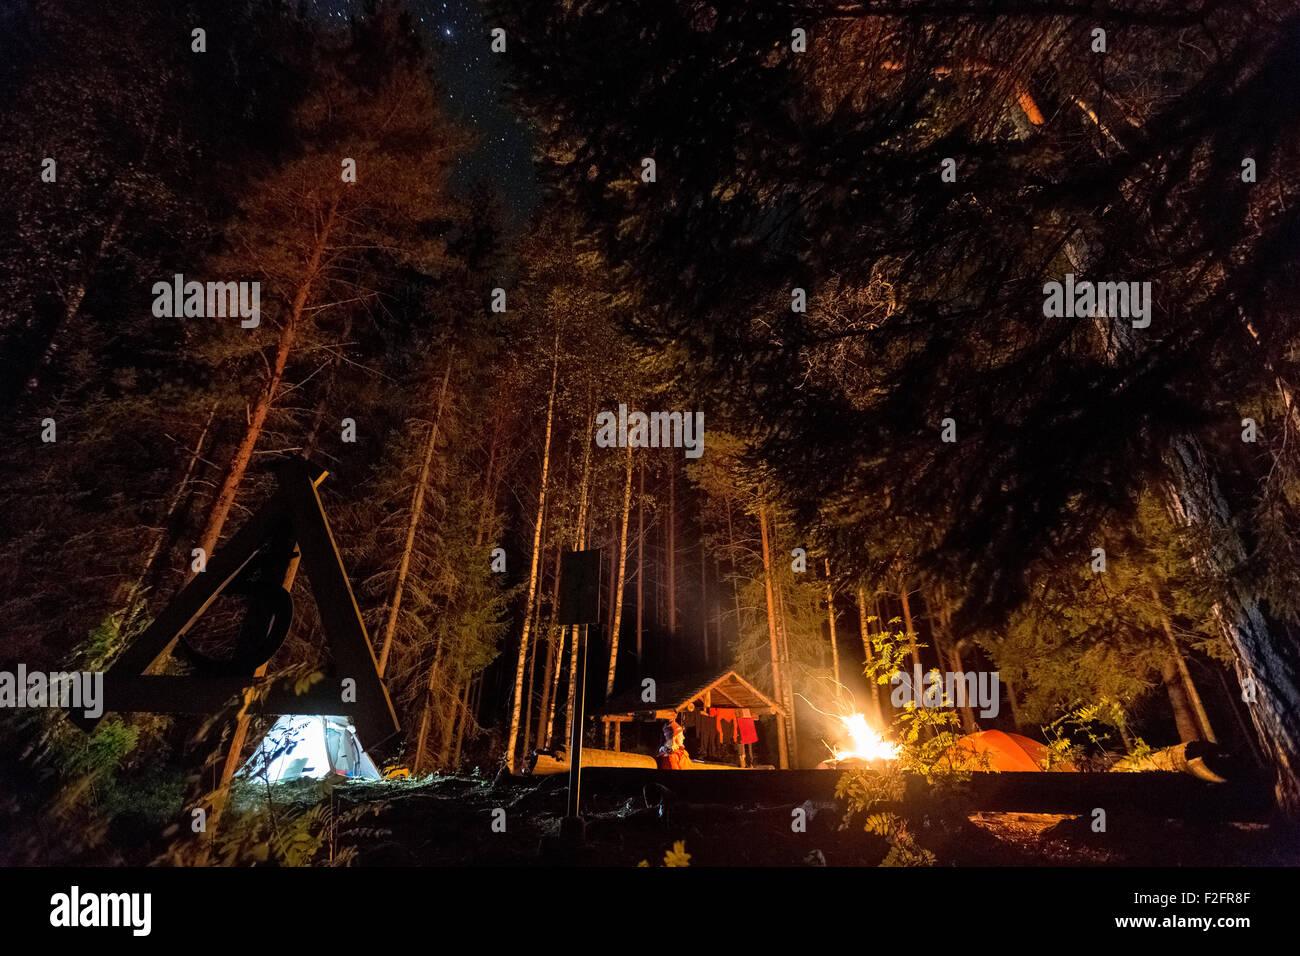 Camping at Lylyniemi, Jämsä, Finland, Europe, EU - Stock Image